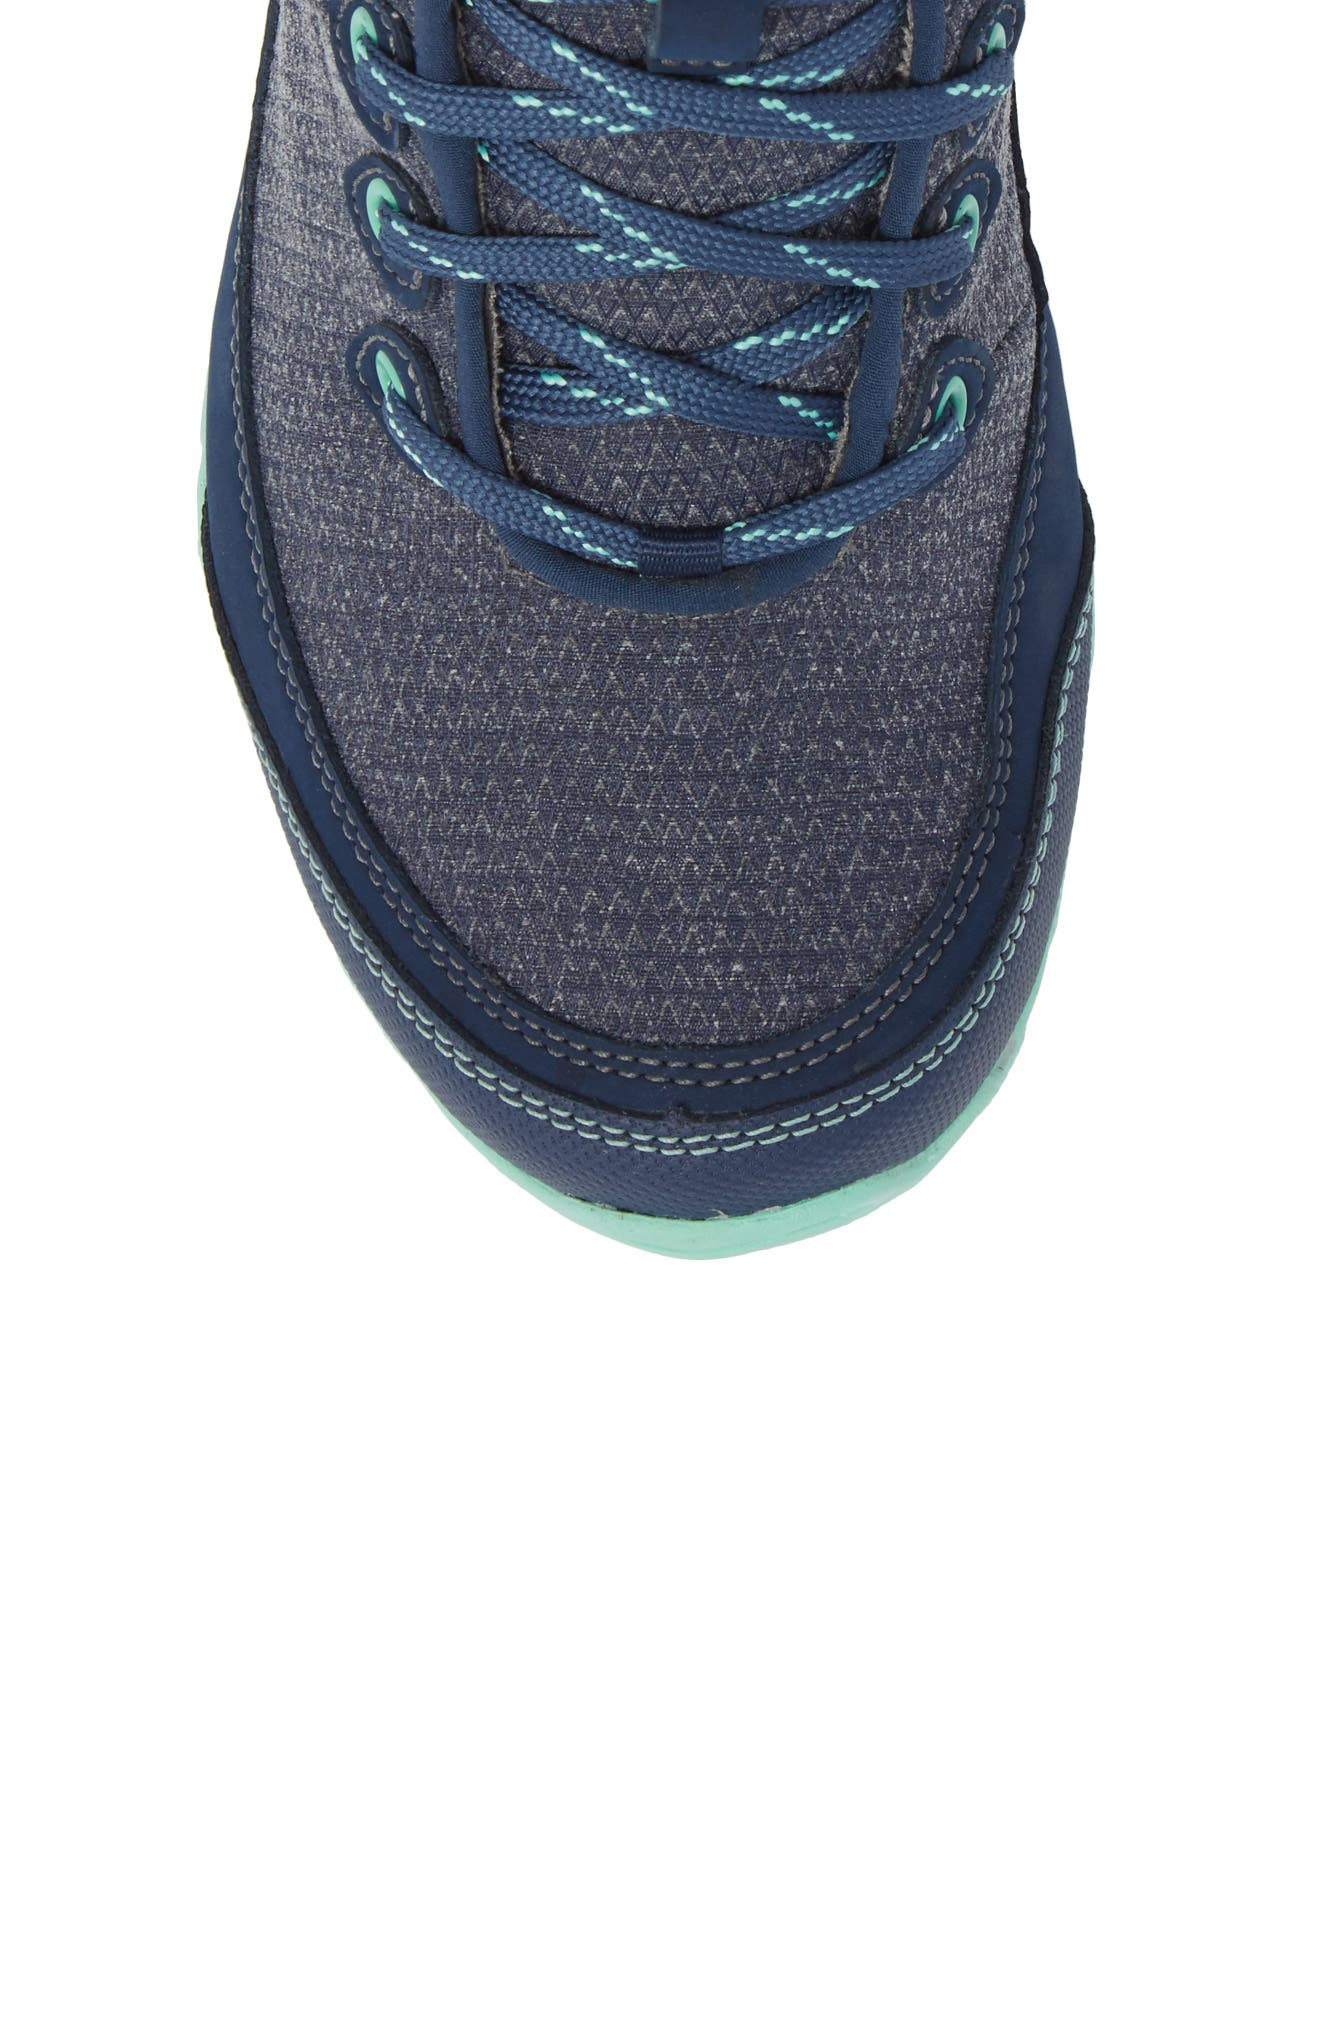 TEVA, Ahnu by Teva Sugarpine II Waterproof Hiking Boot, Alternate thumbnail 5, color, INSIGNIA BLUE